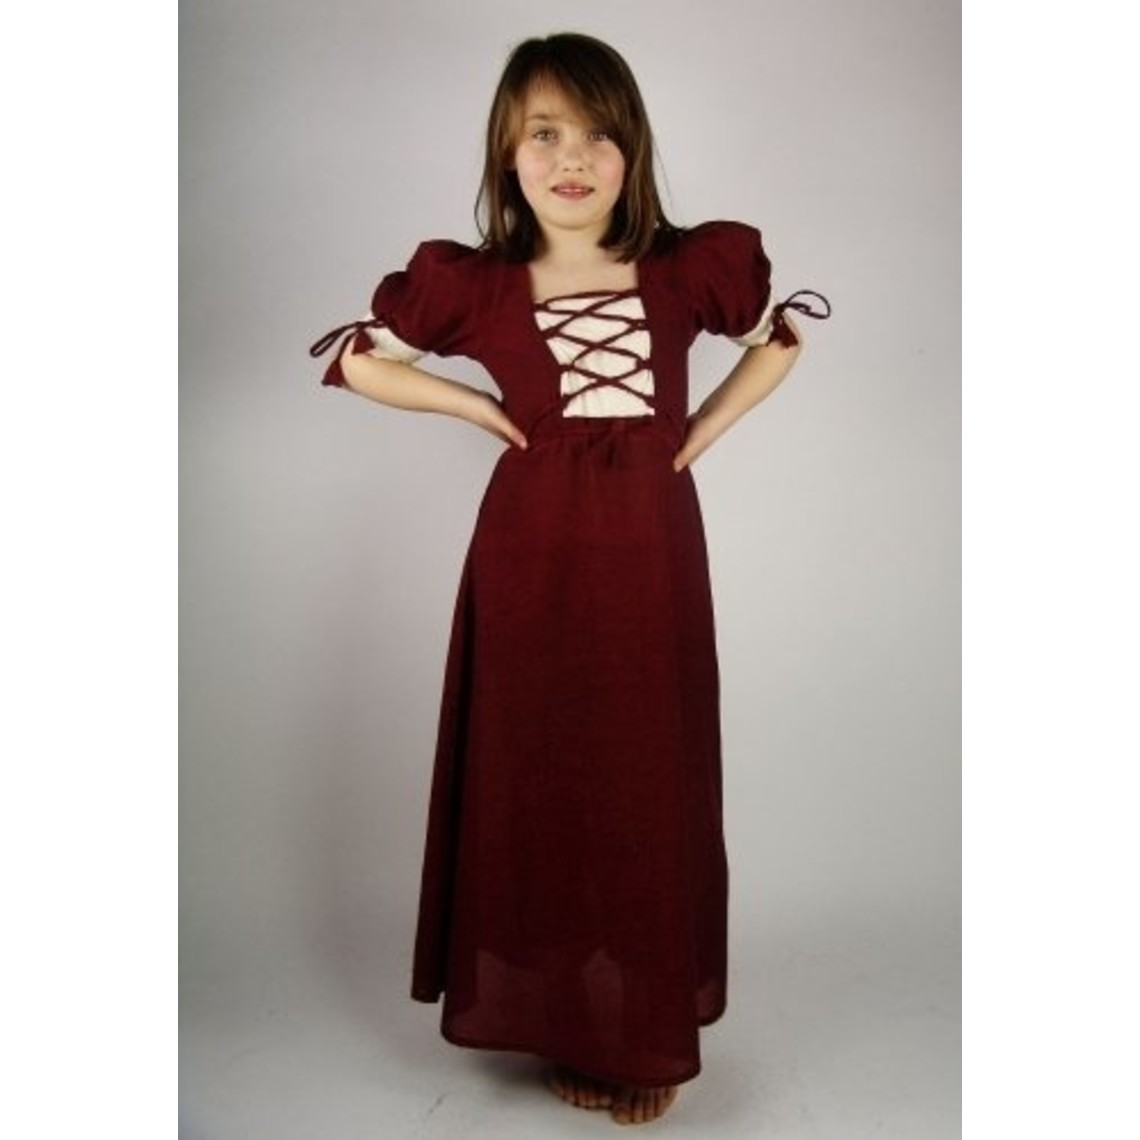 Leonardo Carbone Meisjesjurk Nina, rood